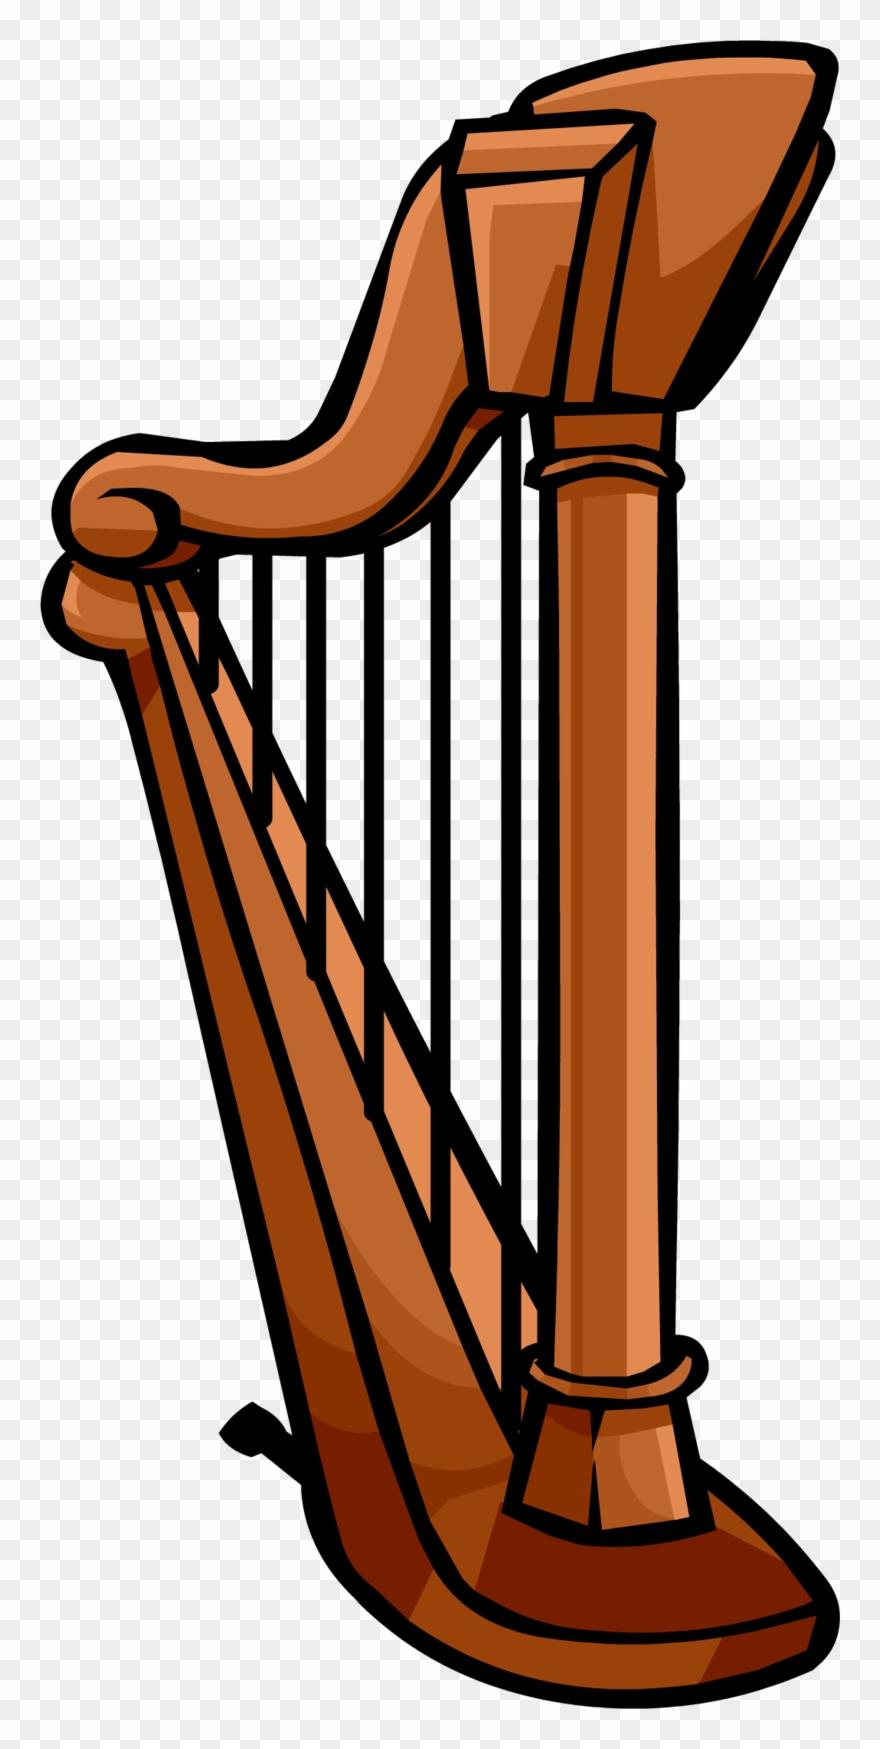 Harp Transparent Background.